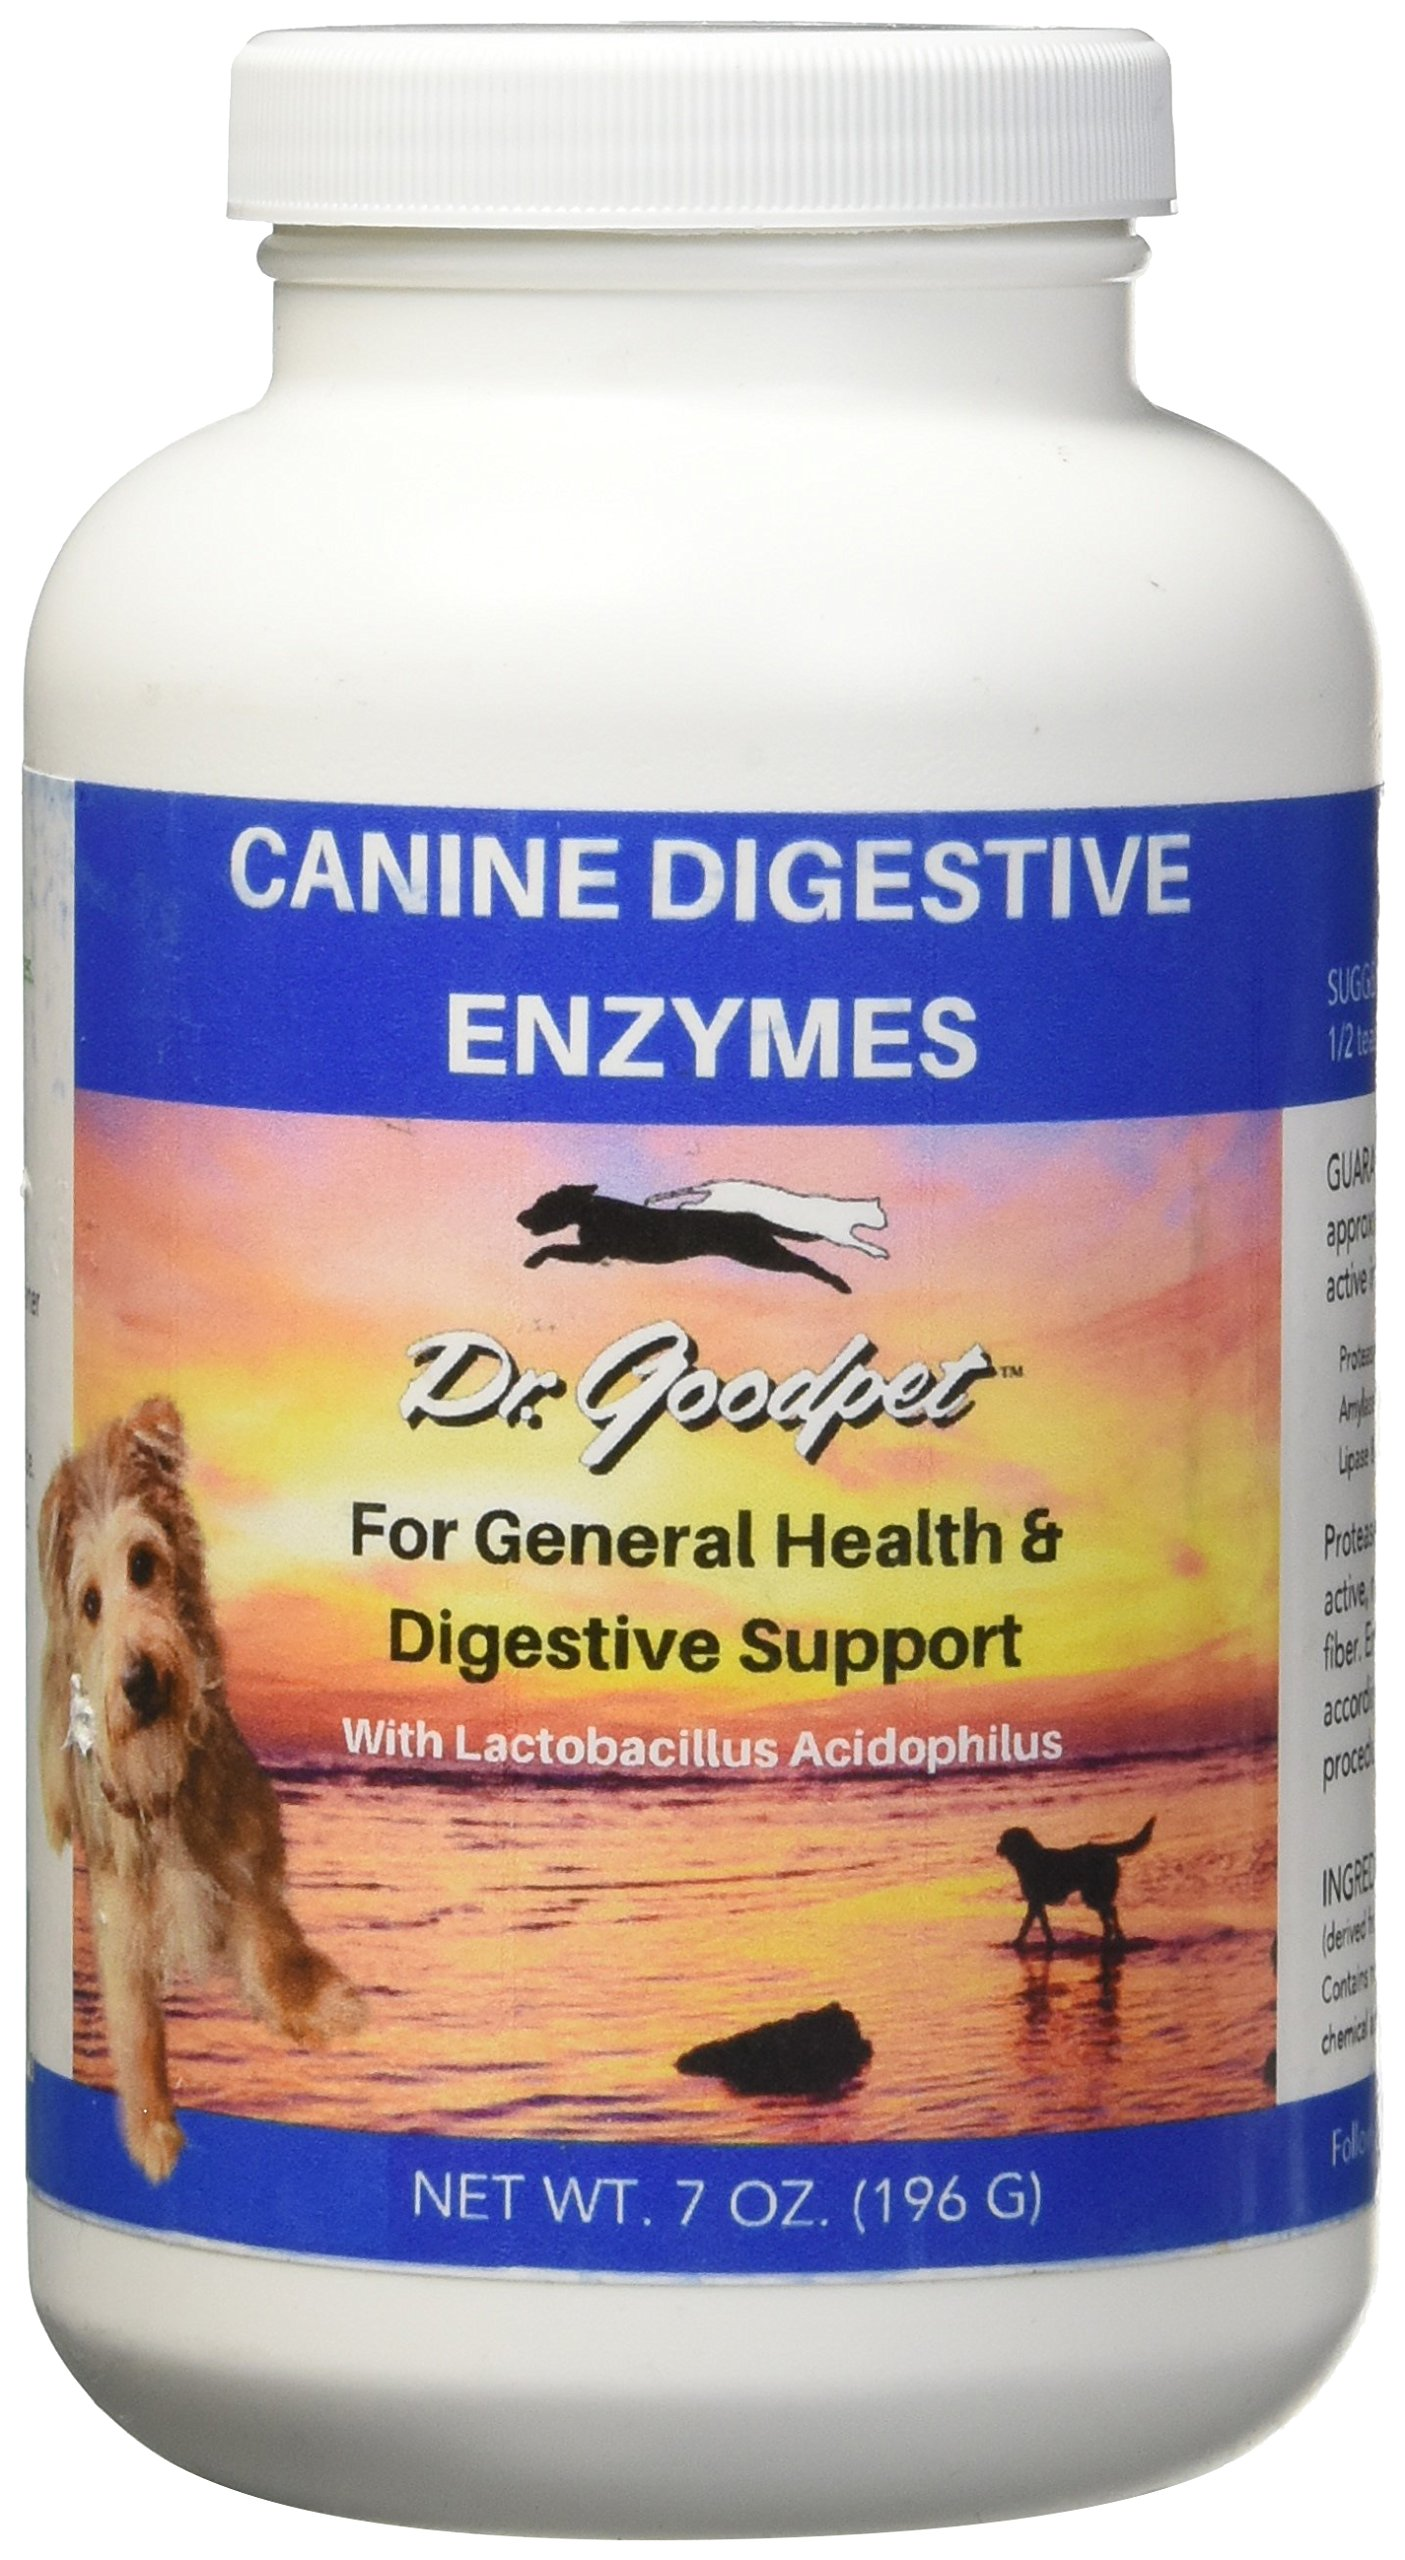 Dr. Goodpet - Canine Formula Digestive Enzymes - 7 oz